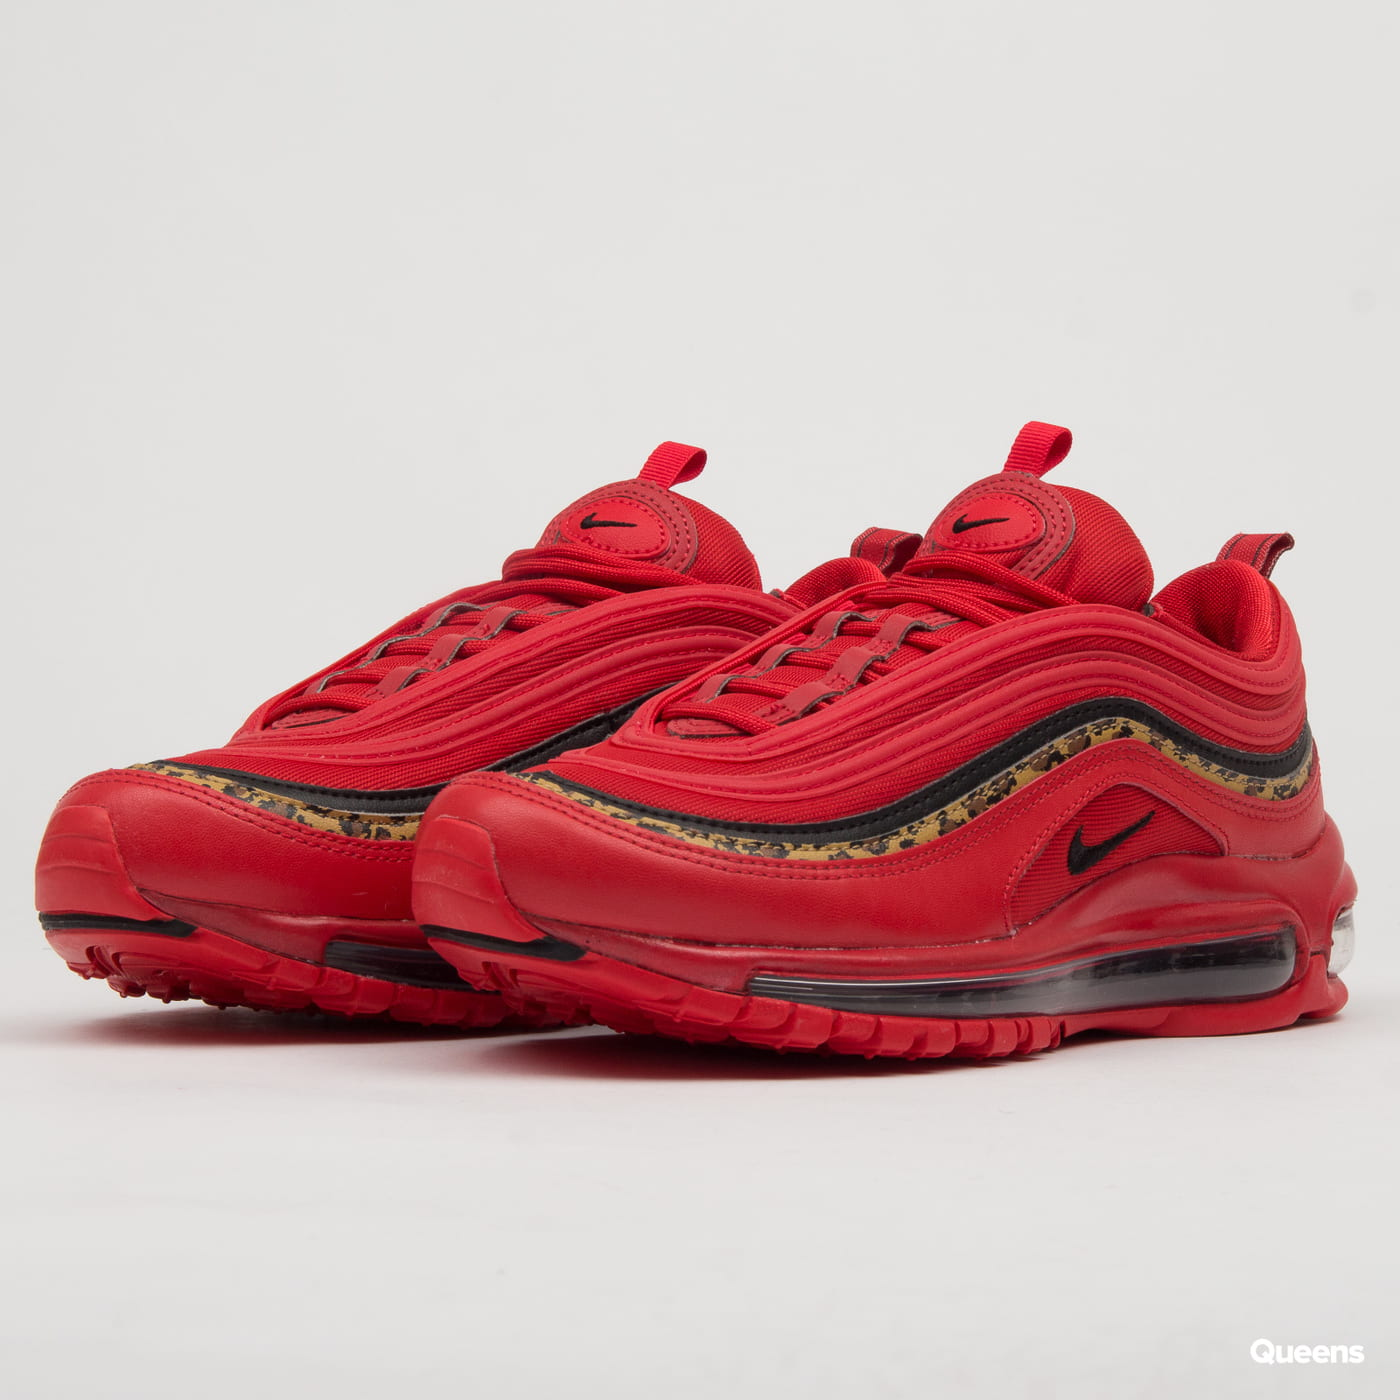 ca003e2c8c8f9 Nike W Air Max 97 university red / black - print (BV6113-600) – Queens 💚